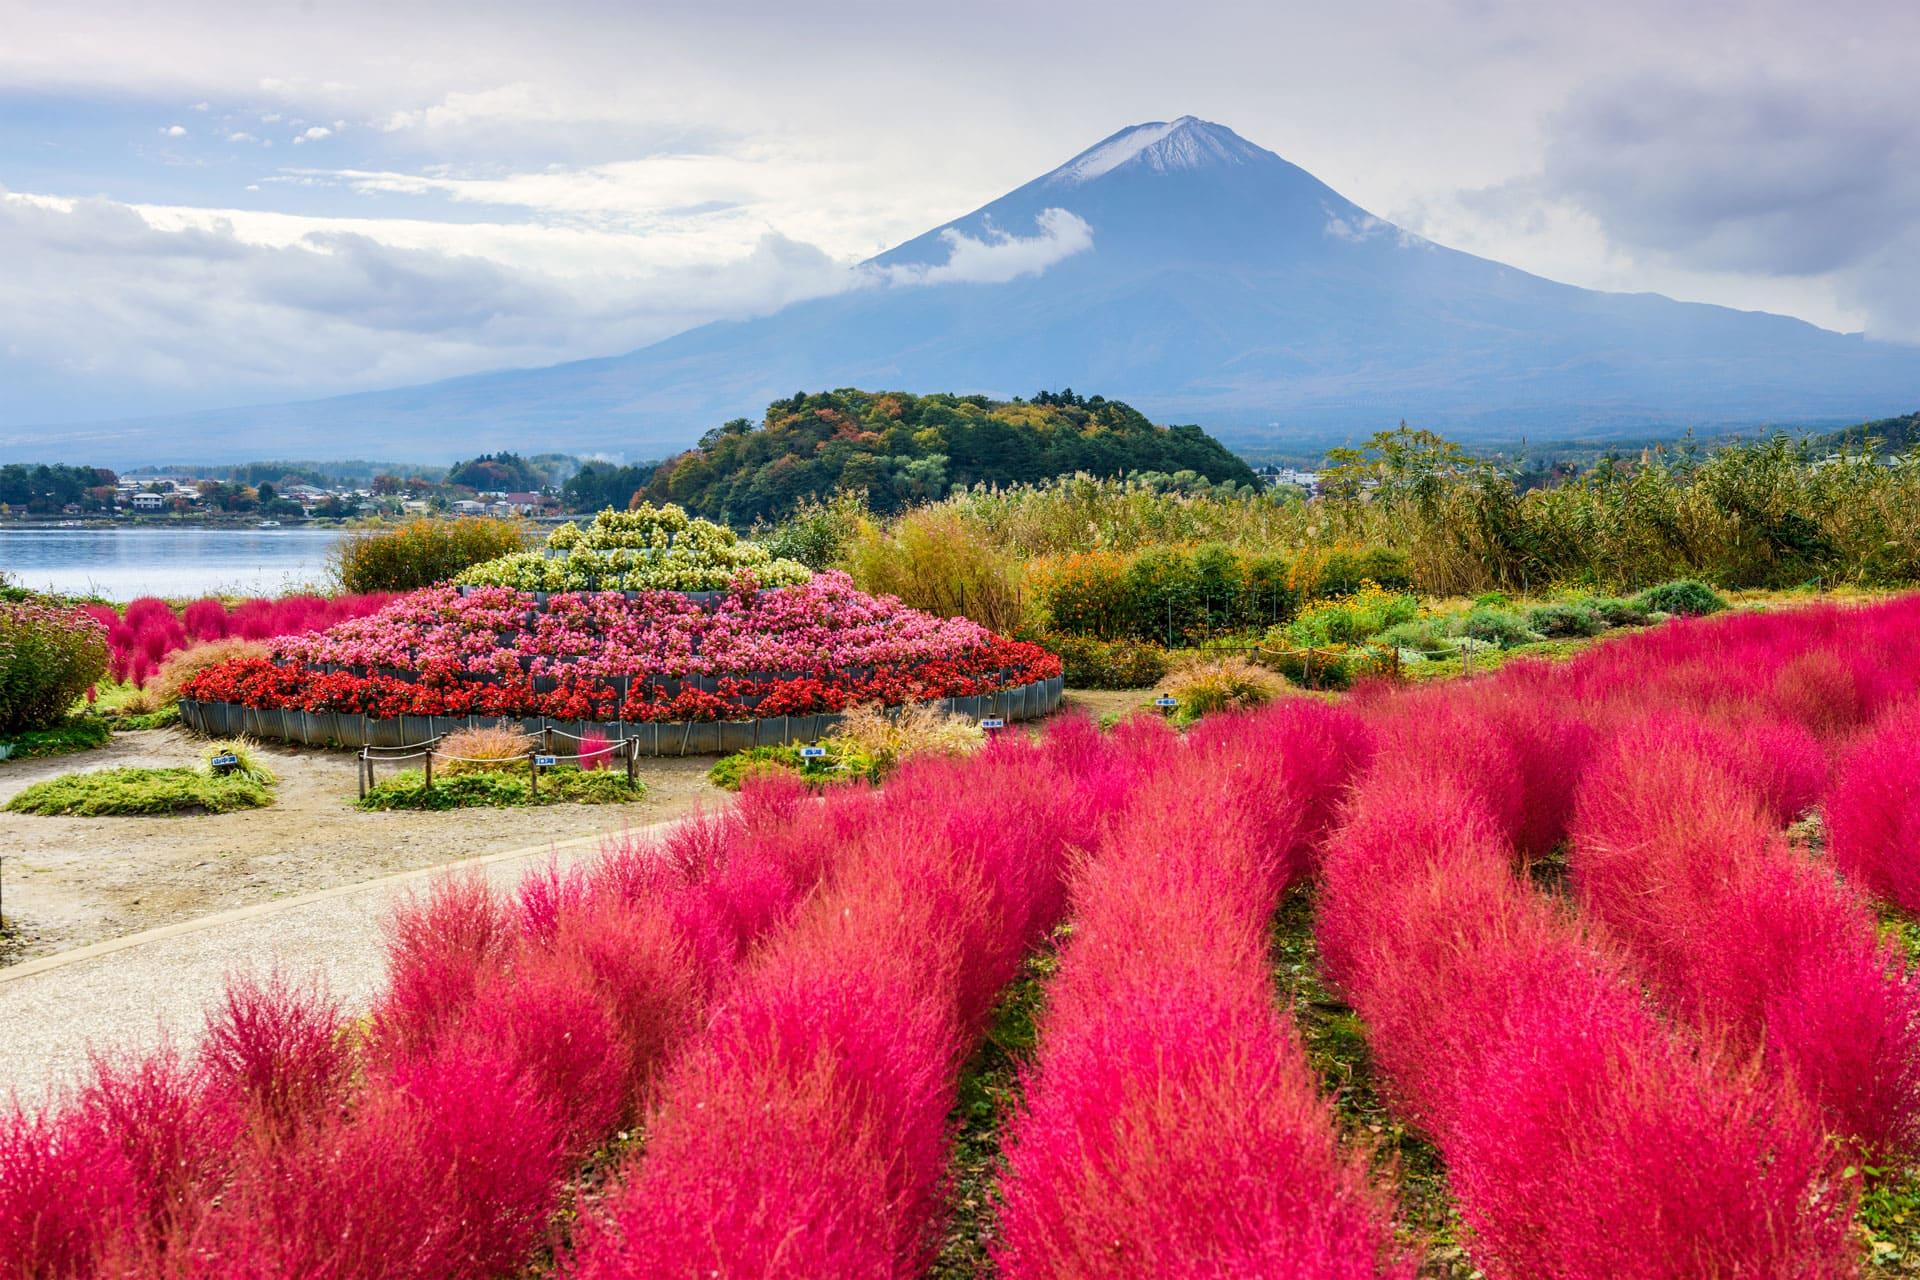 Oishi park Kawaguchiko Mount Fuji Japan